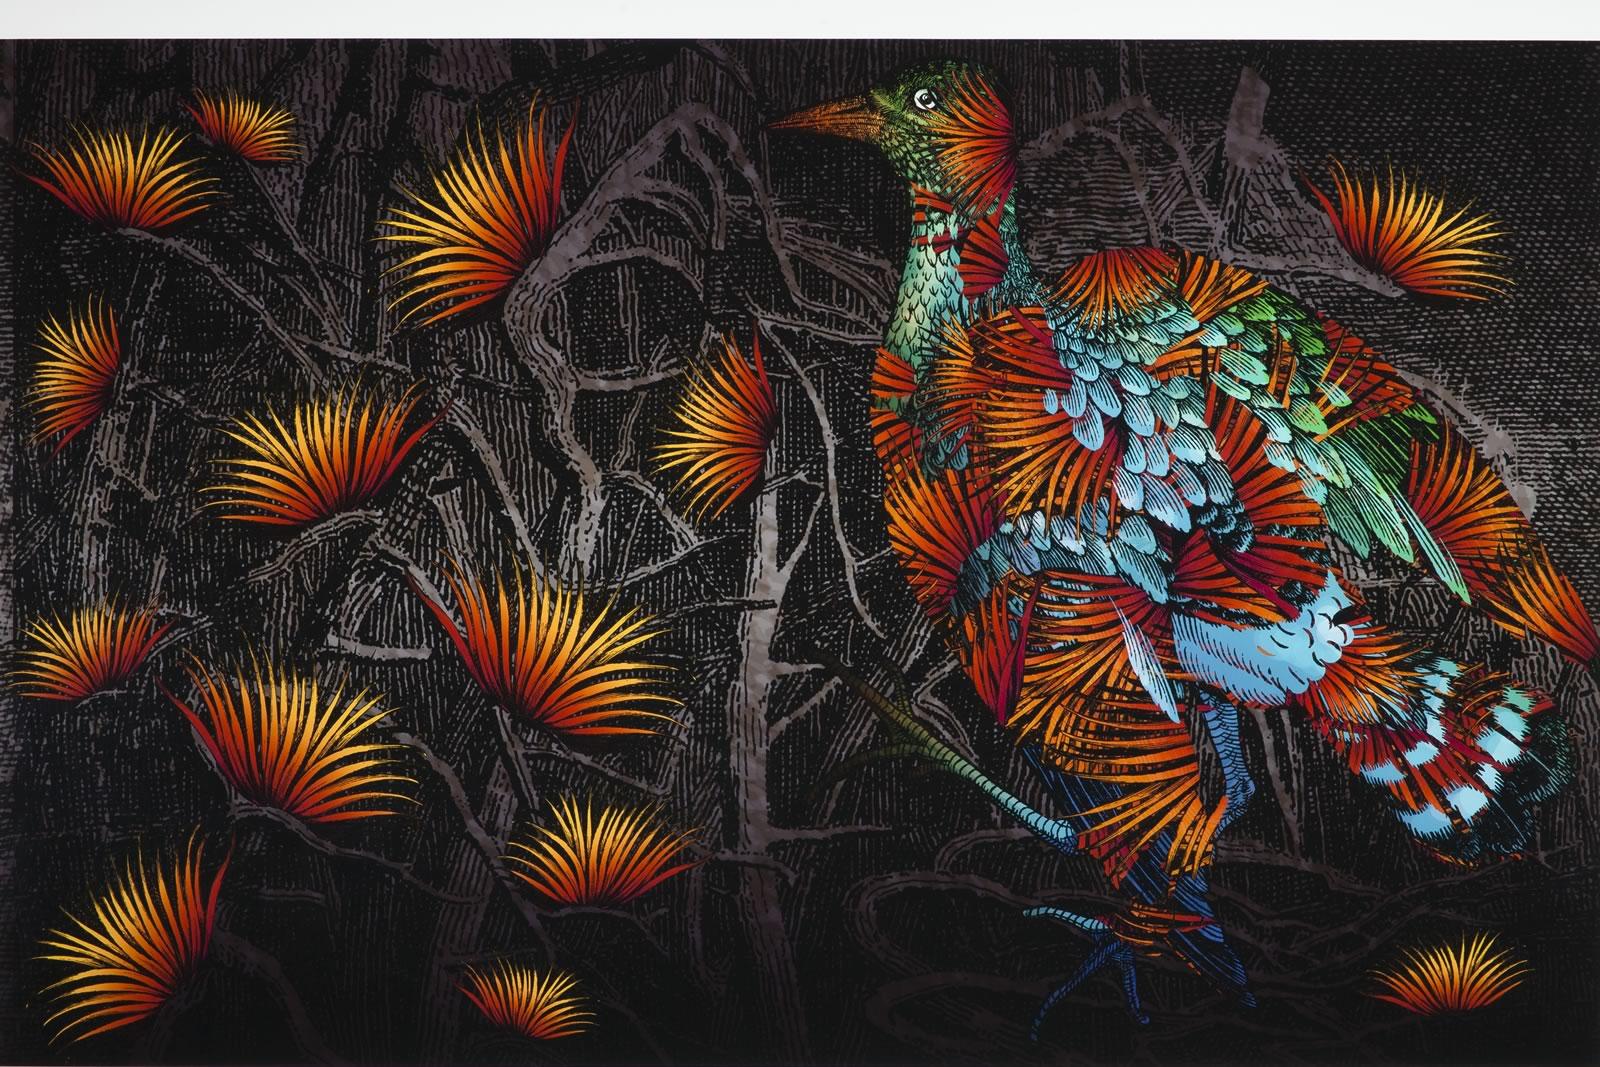 2009 Winner of The Hutchins Art Prize - Milan Milojevic, Tasmania - Pinnacle Grouse (after Audubon)